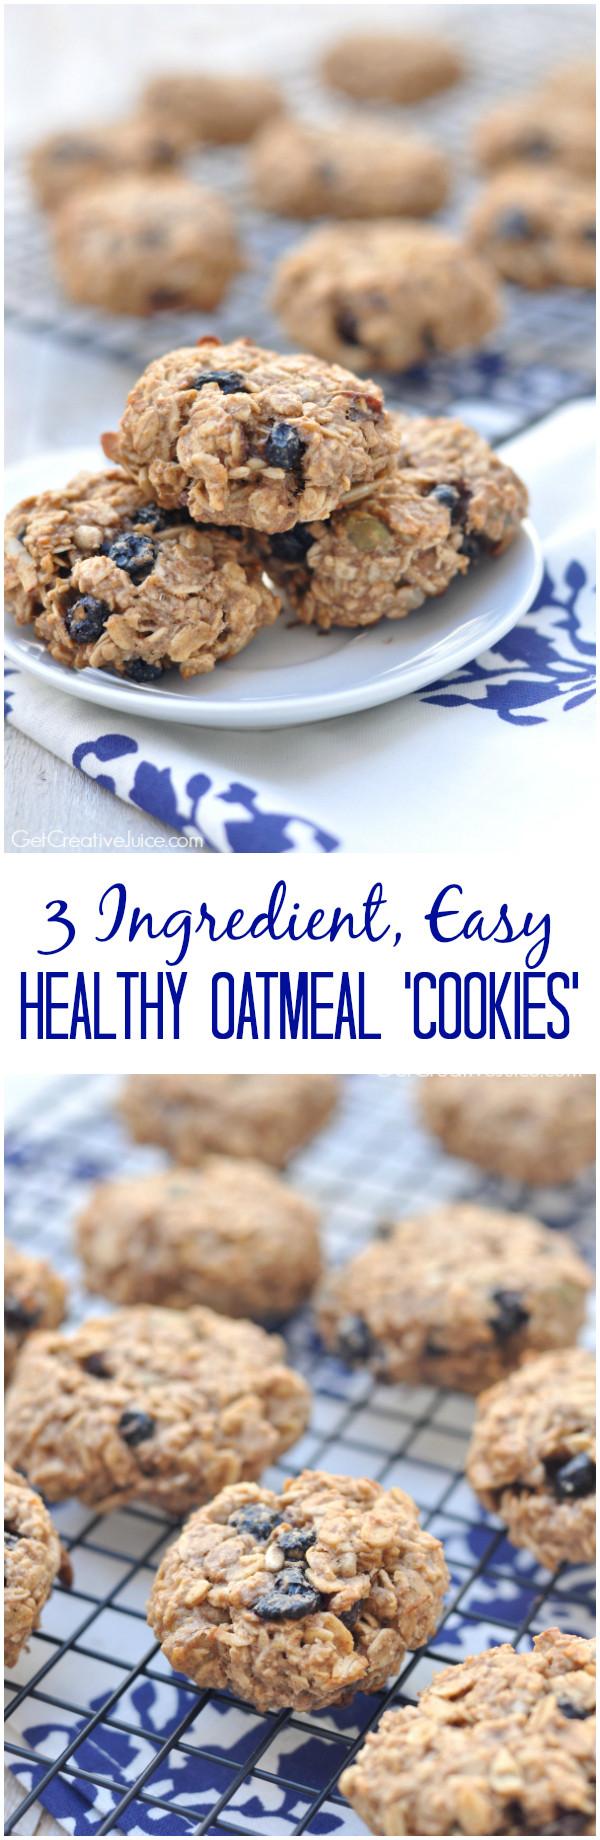 Healthy Homemade Oatmeal Cookies  Easy 3 Ingre nt Healthy Oatmeal Cookies Creative Juice